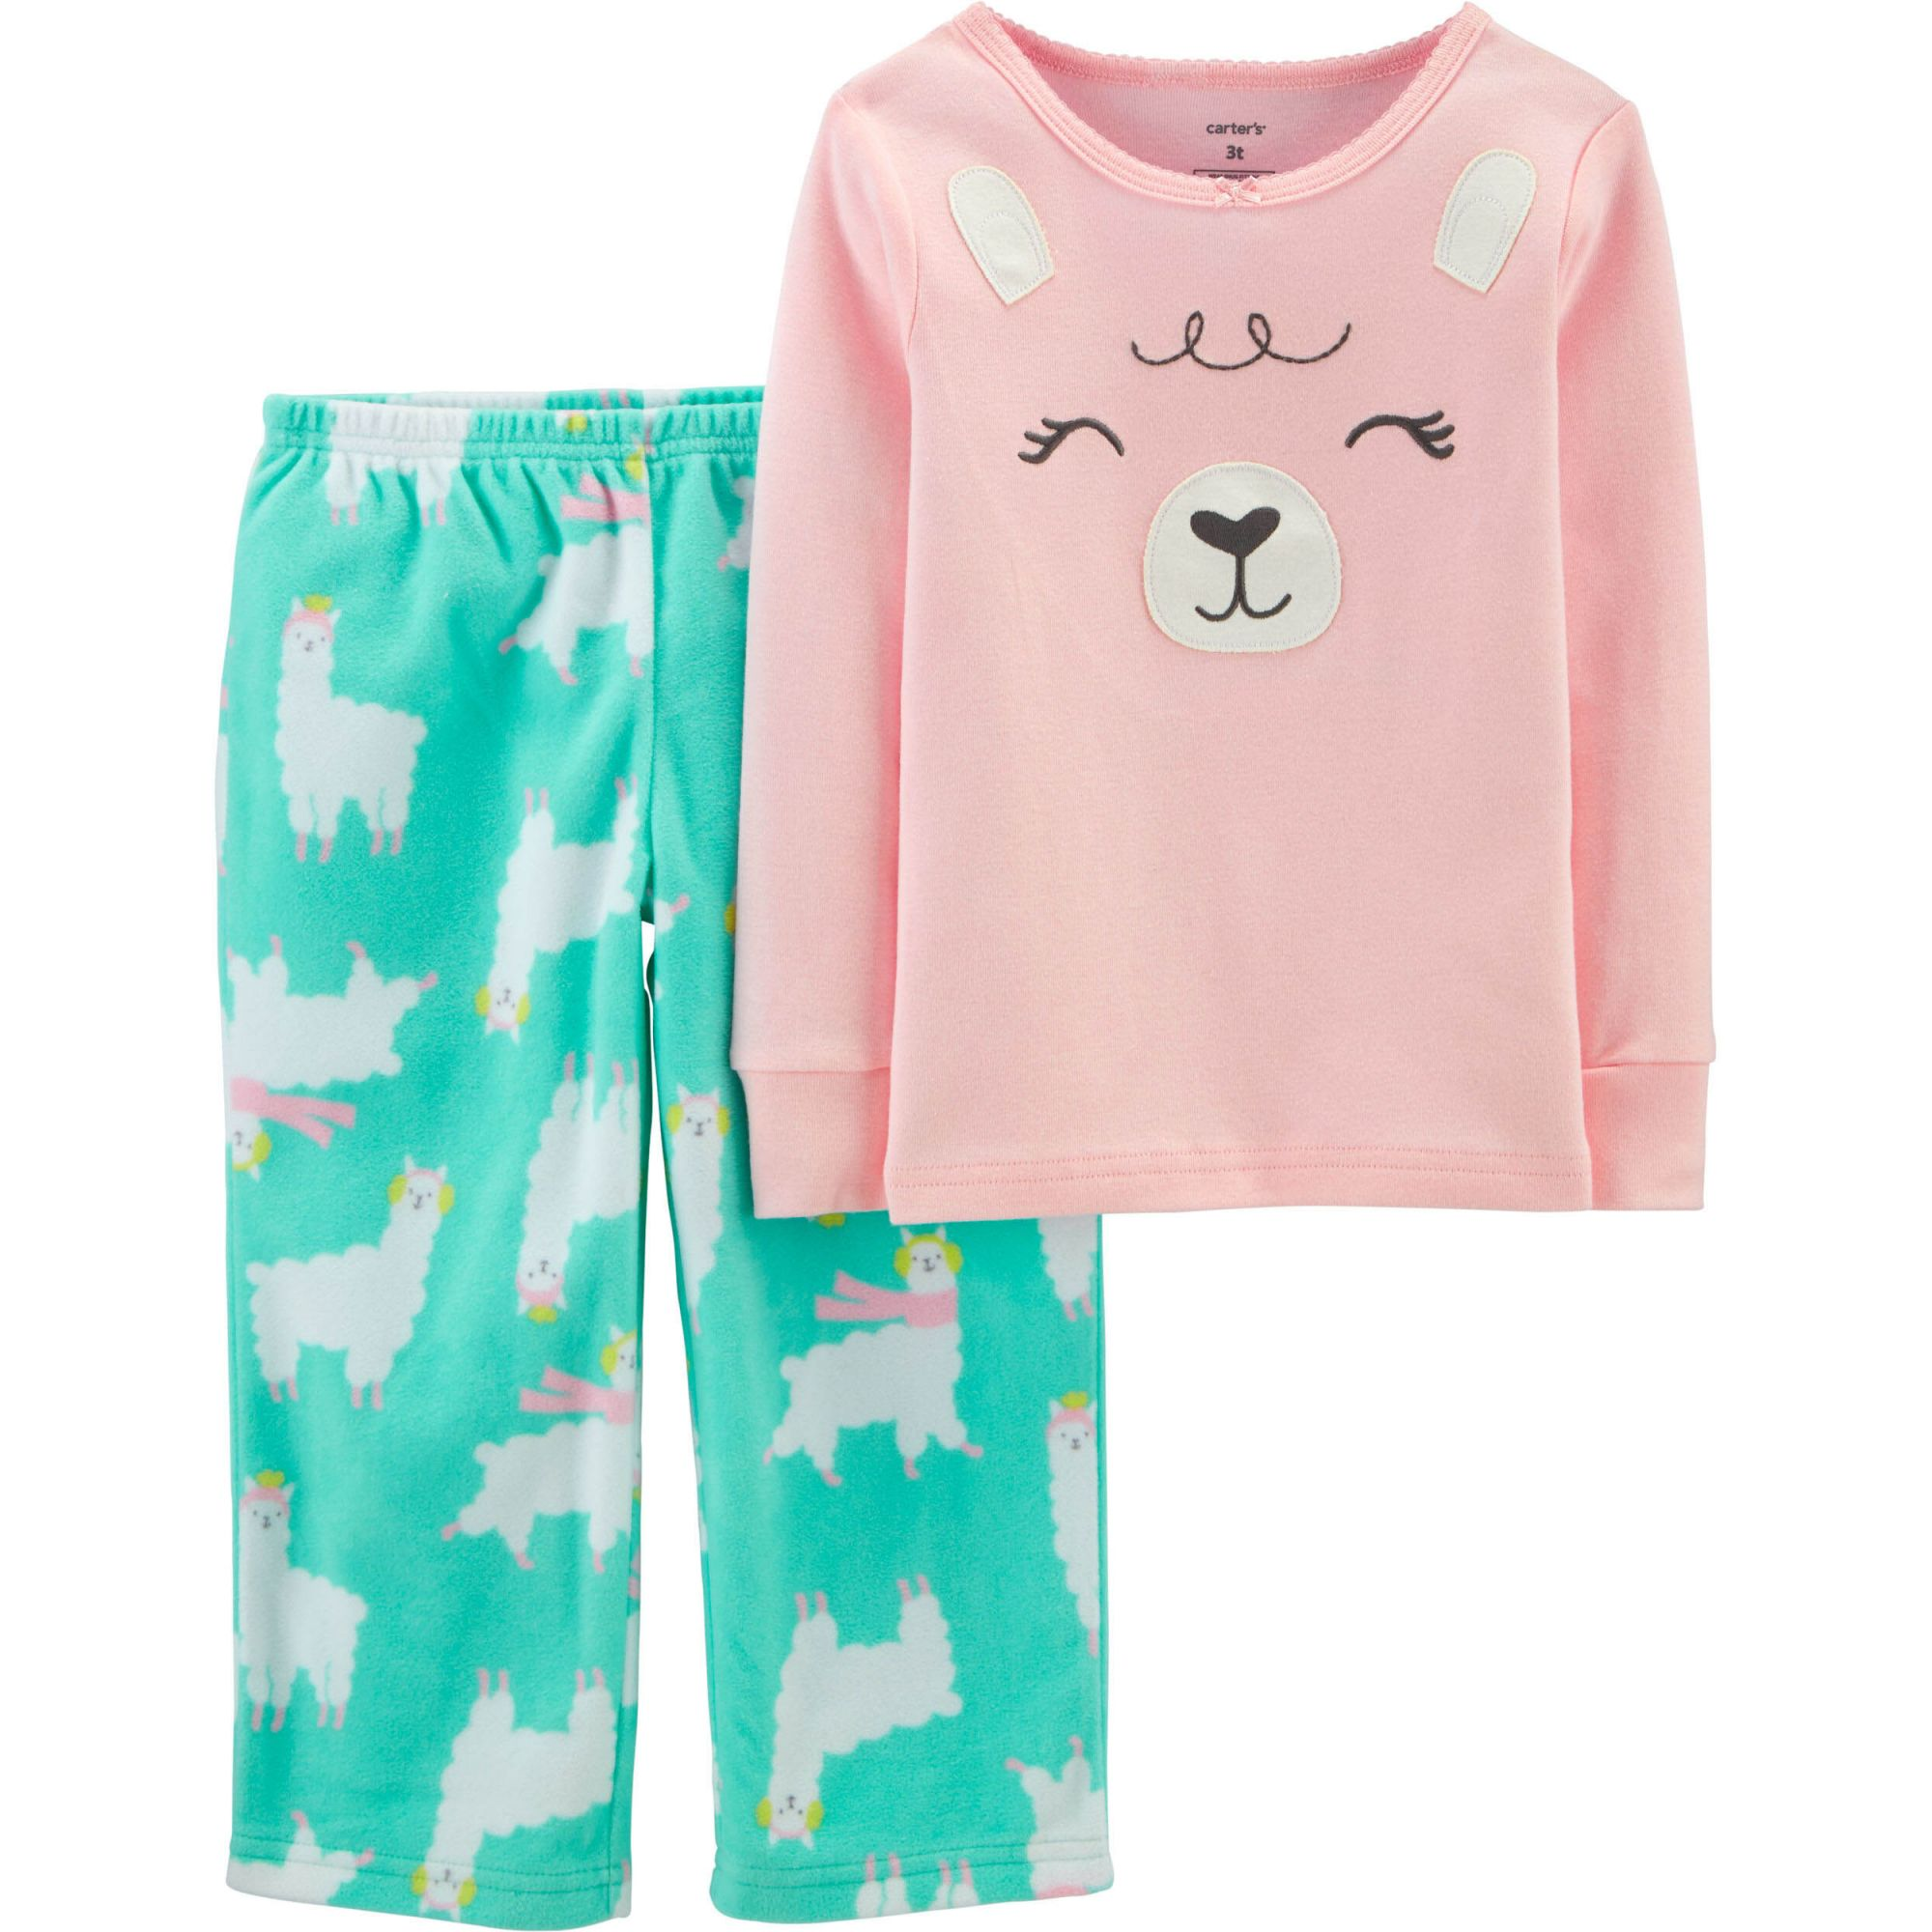 Pijama Infantil Fleece e malha 2 peças Lhama